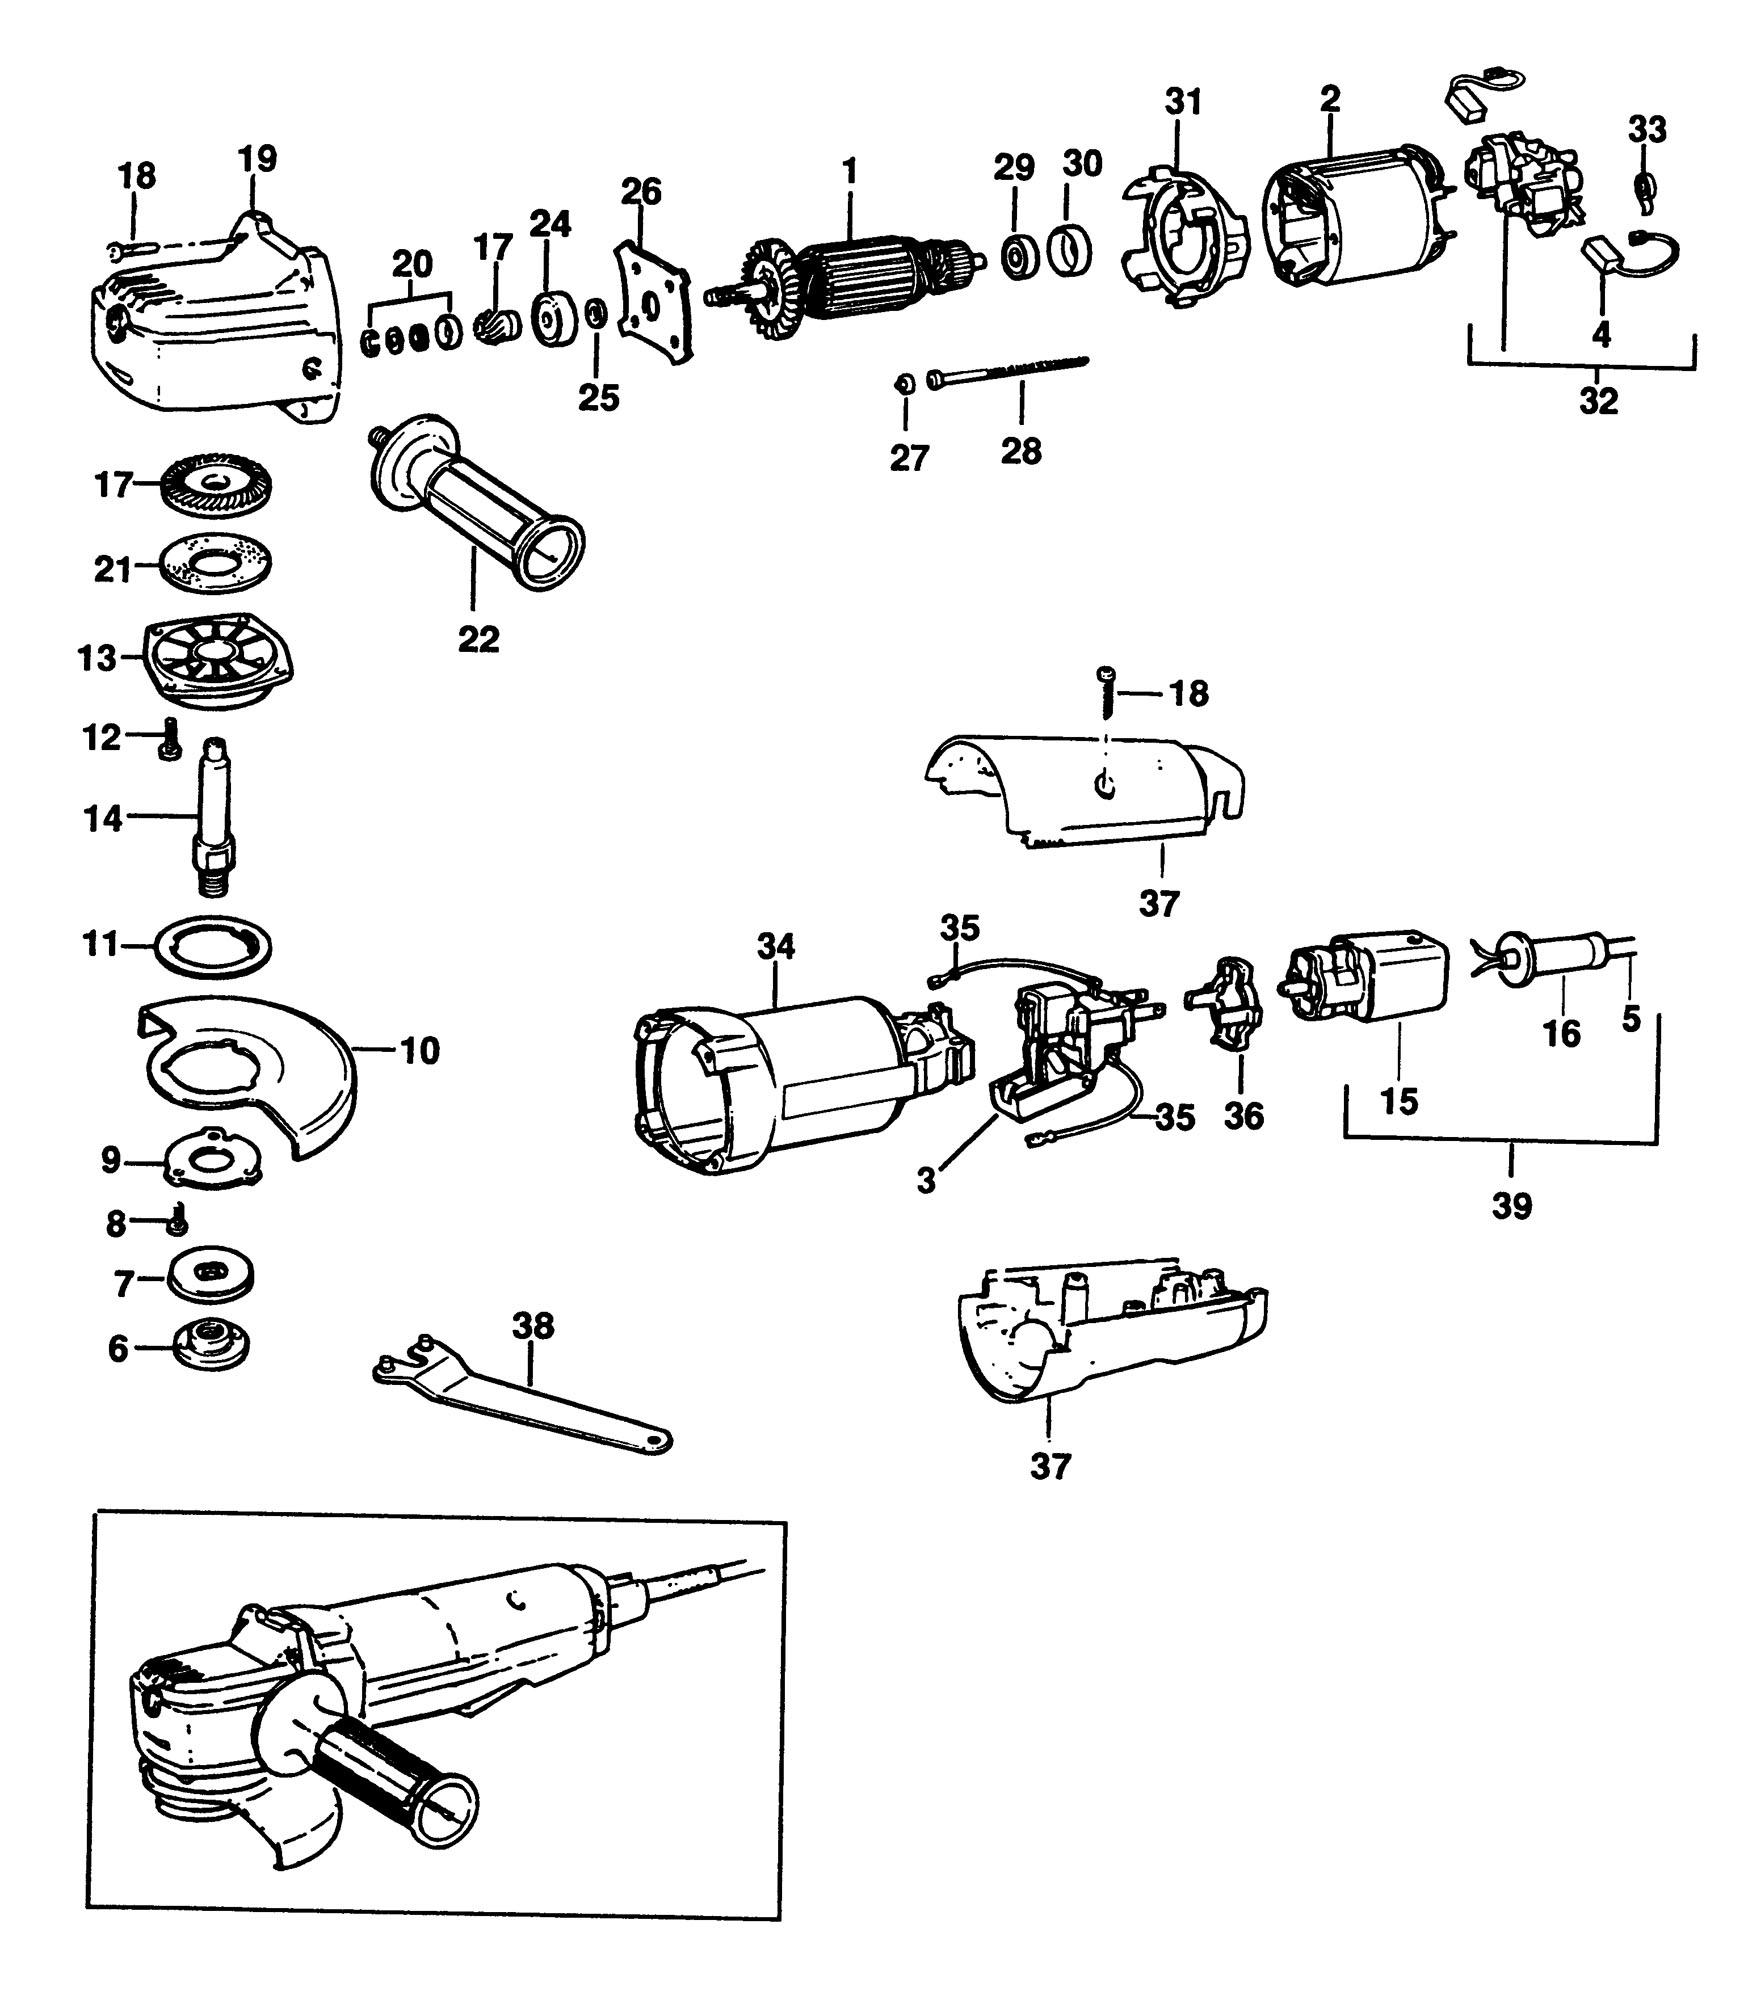 Spares For Black Amp Decker Pl80 Sander Grinder Type 2 Spare Pl80 Type 2 From Power Tool Centre